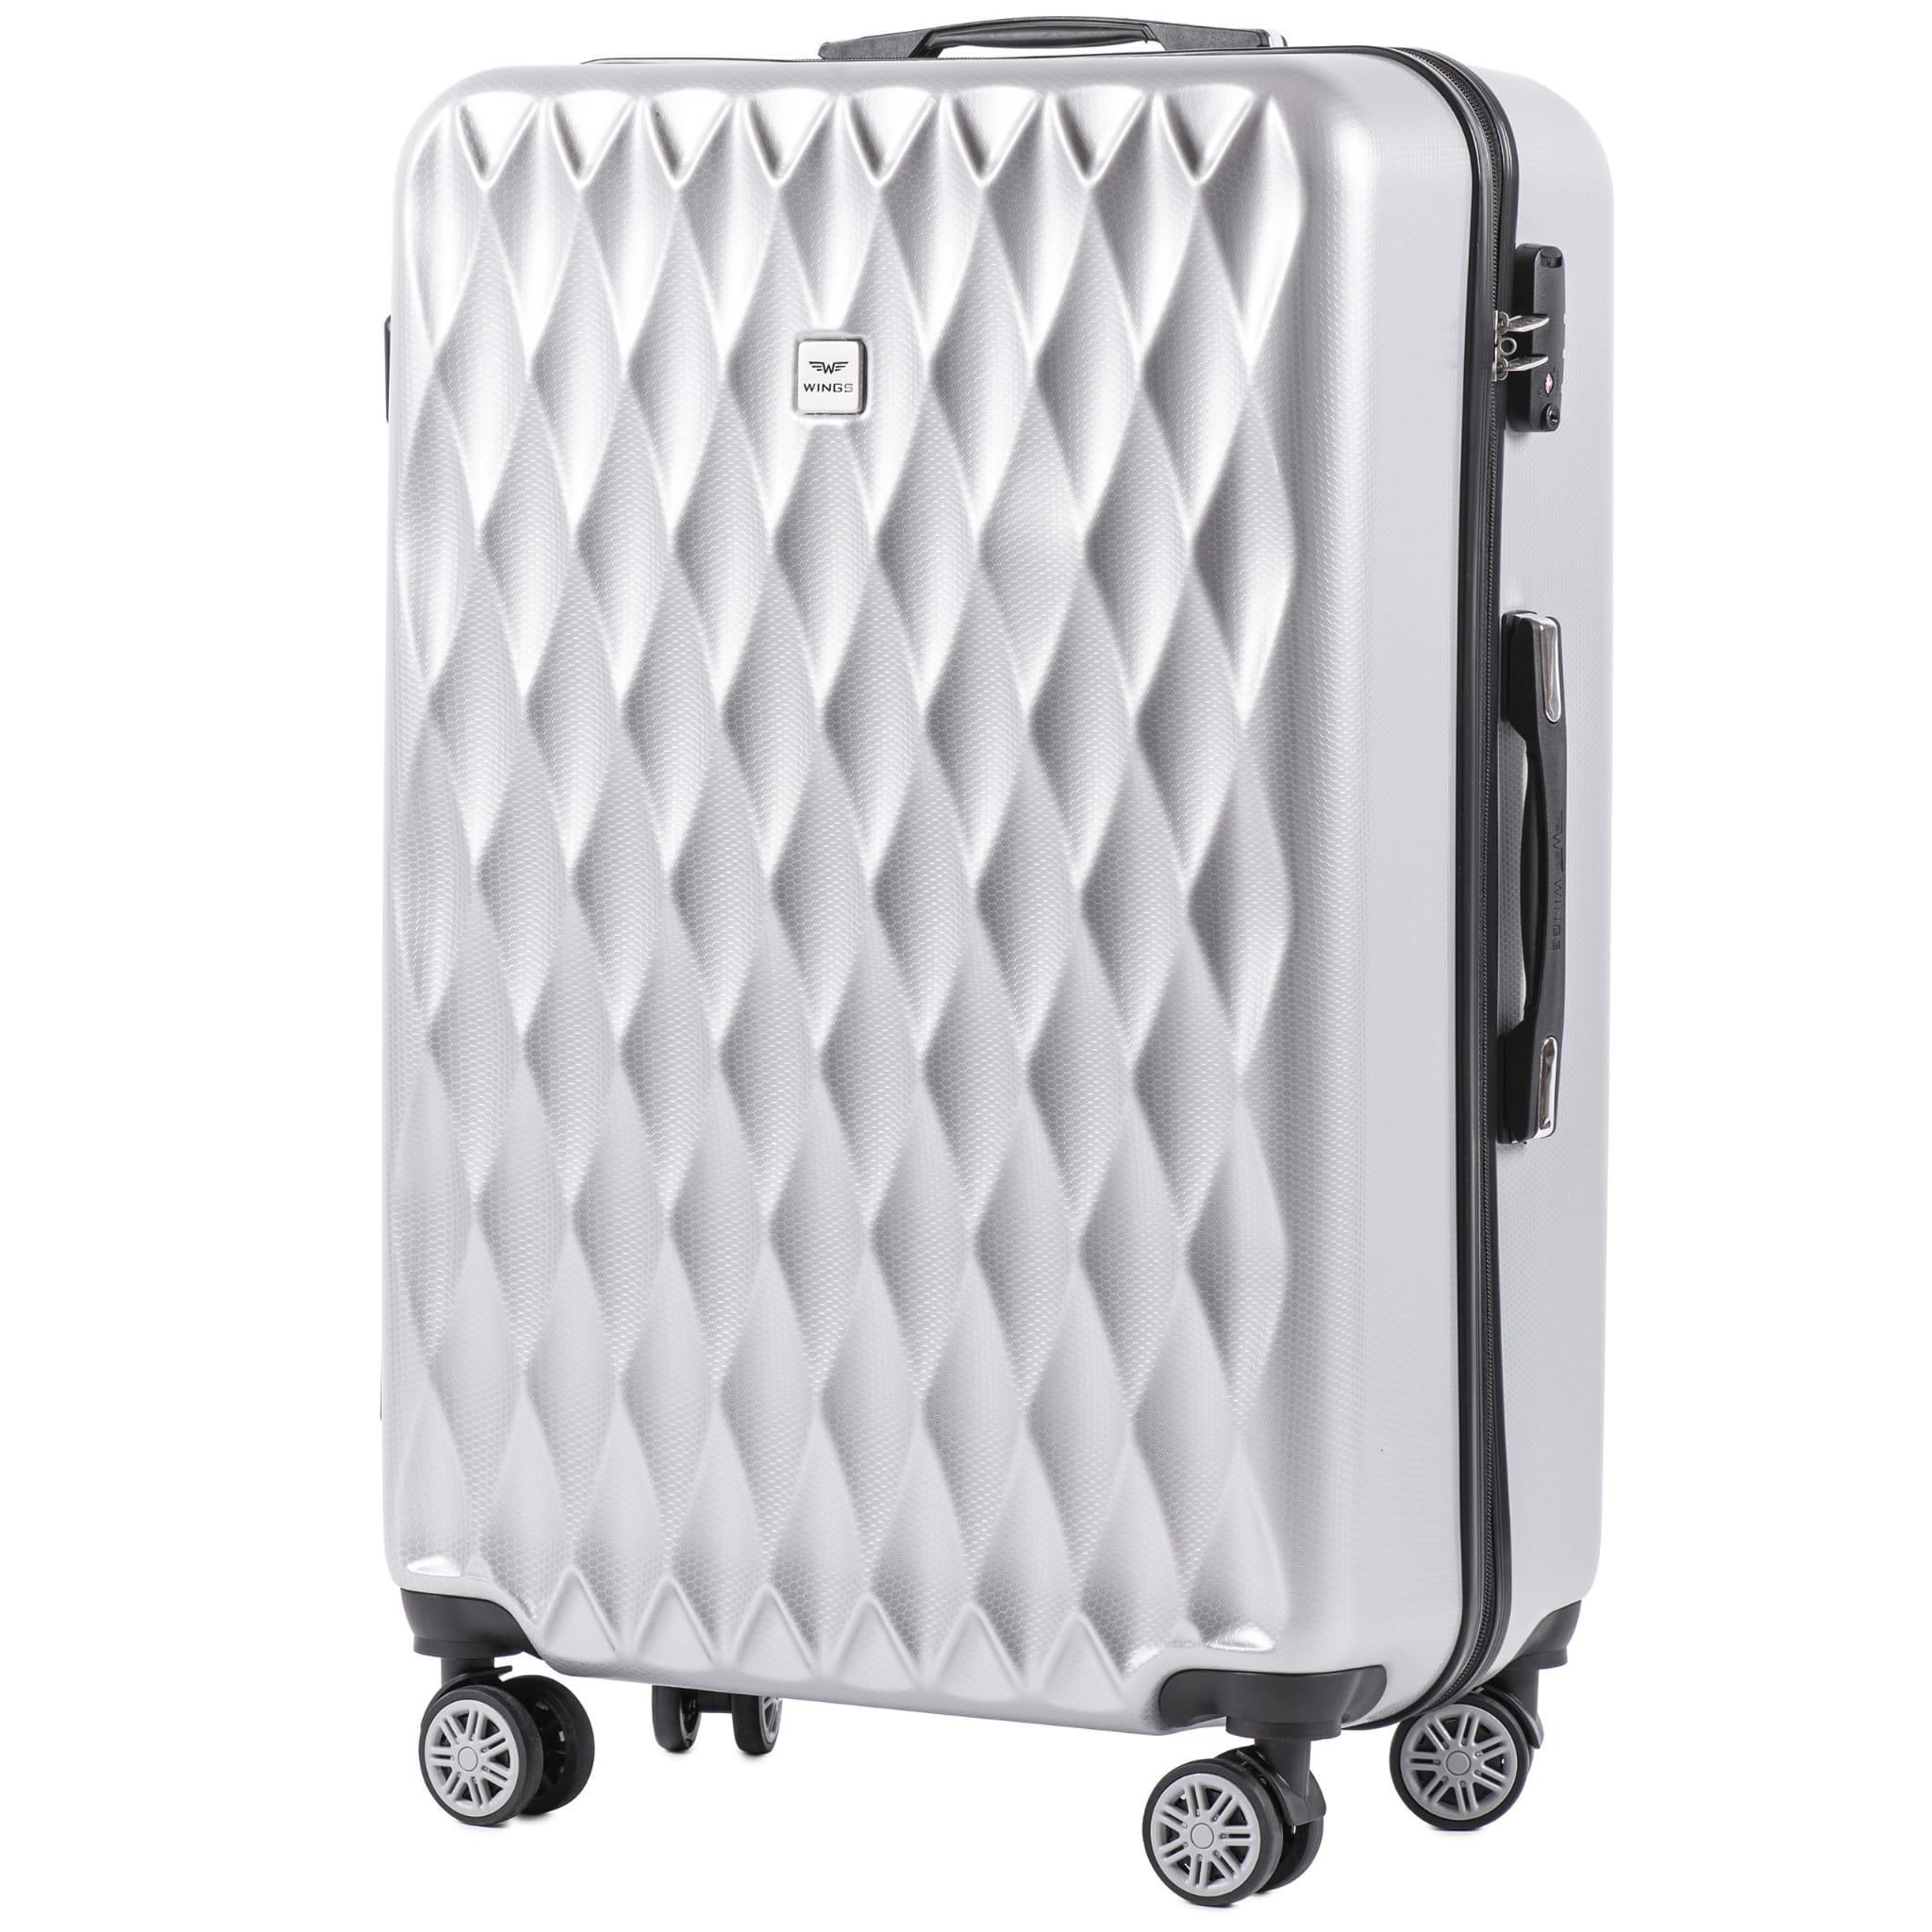 БОЛЬШОЙ ЧЕМОДАН WINGS PC190 L SILVER  PREMIUM НА 4-Х КАУЧУКОВЫХ КОЛЕСАХ! Для багажа ,до 23 кг!